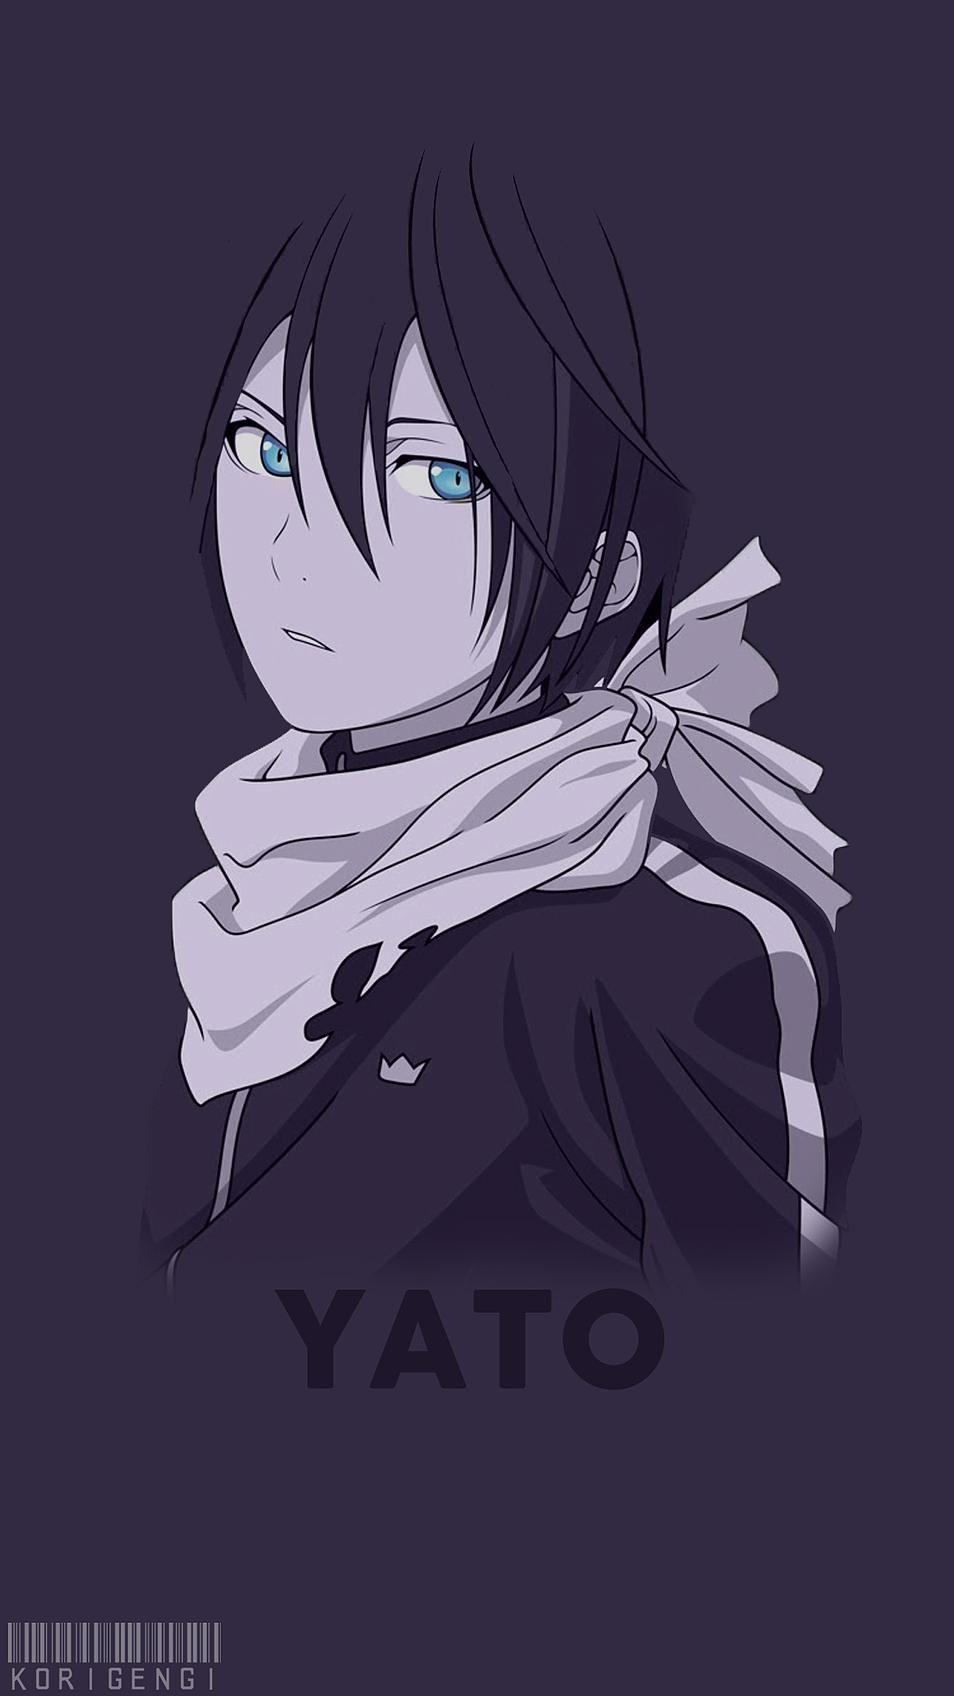 Hot yato special edition korigengi pinterest anime - Yato wallpaper ...